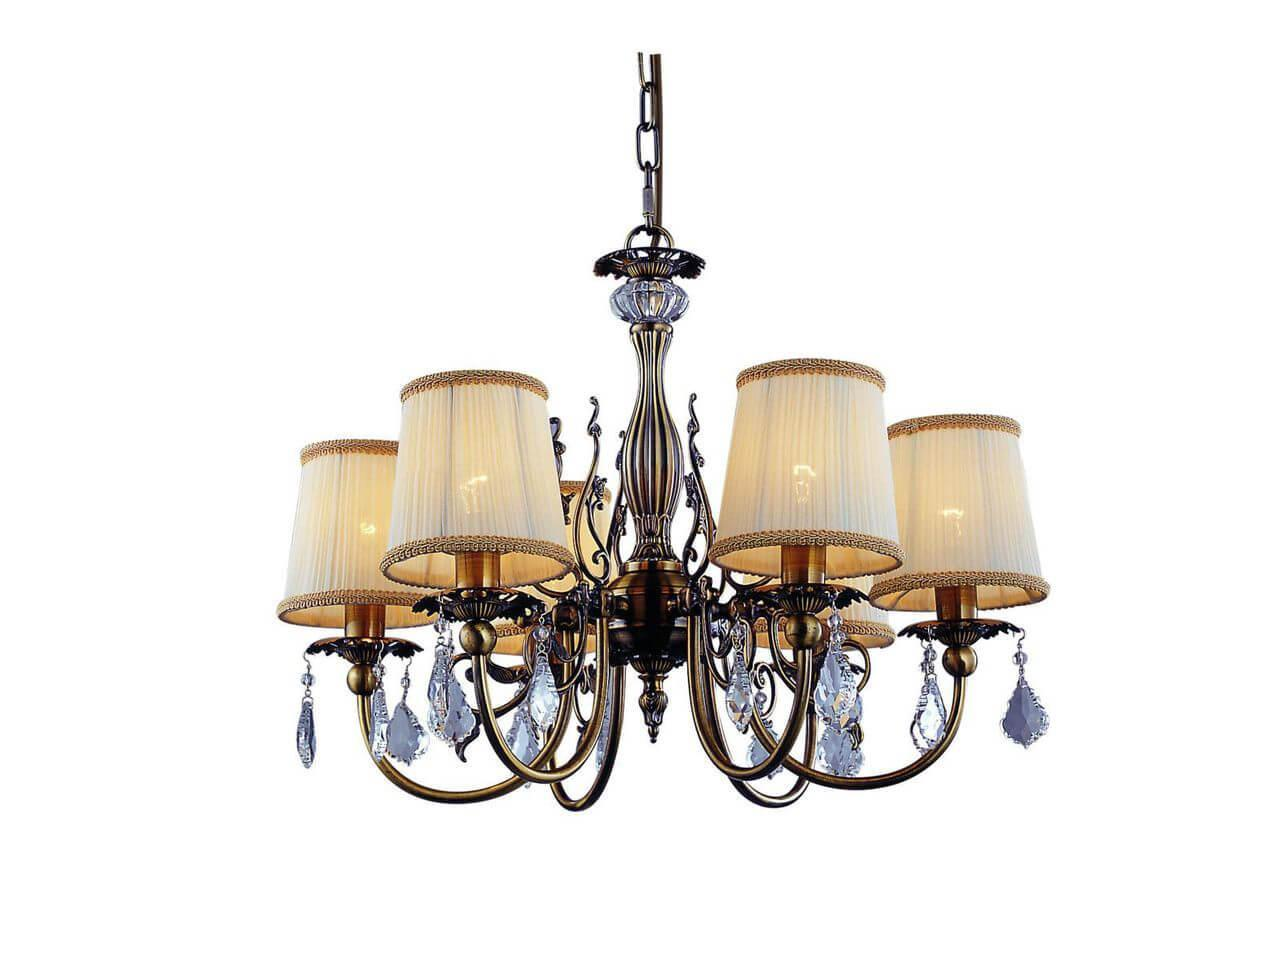 все цены на Подвесной светильник ST Luce SL113.303.06, E14, 40 Вт онлайн